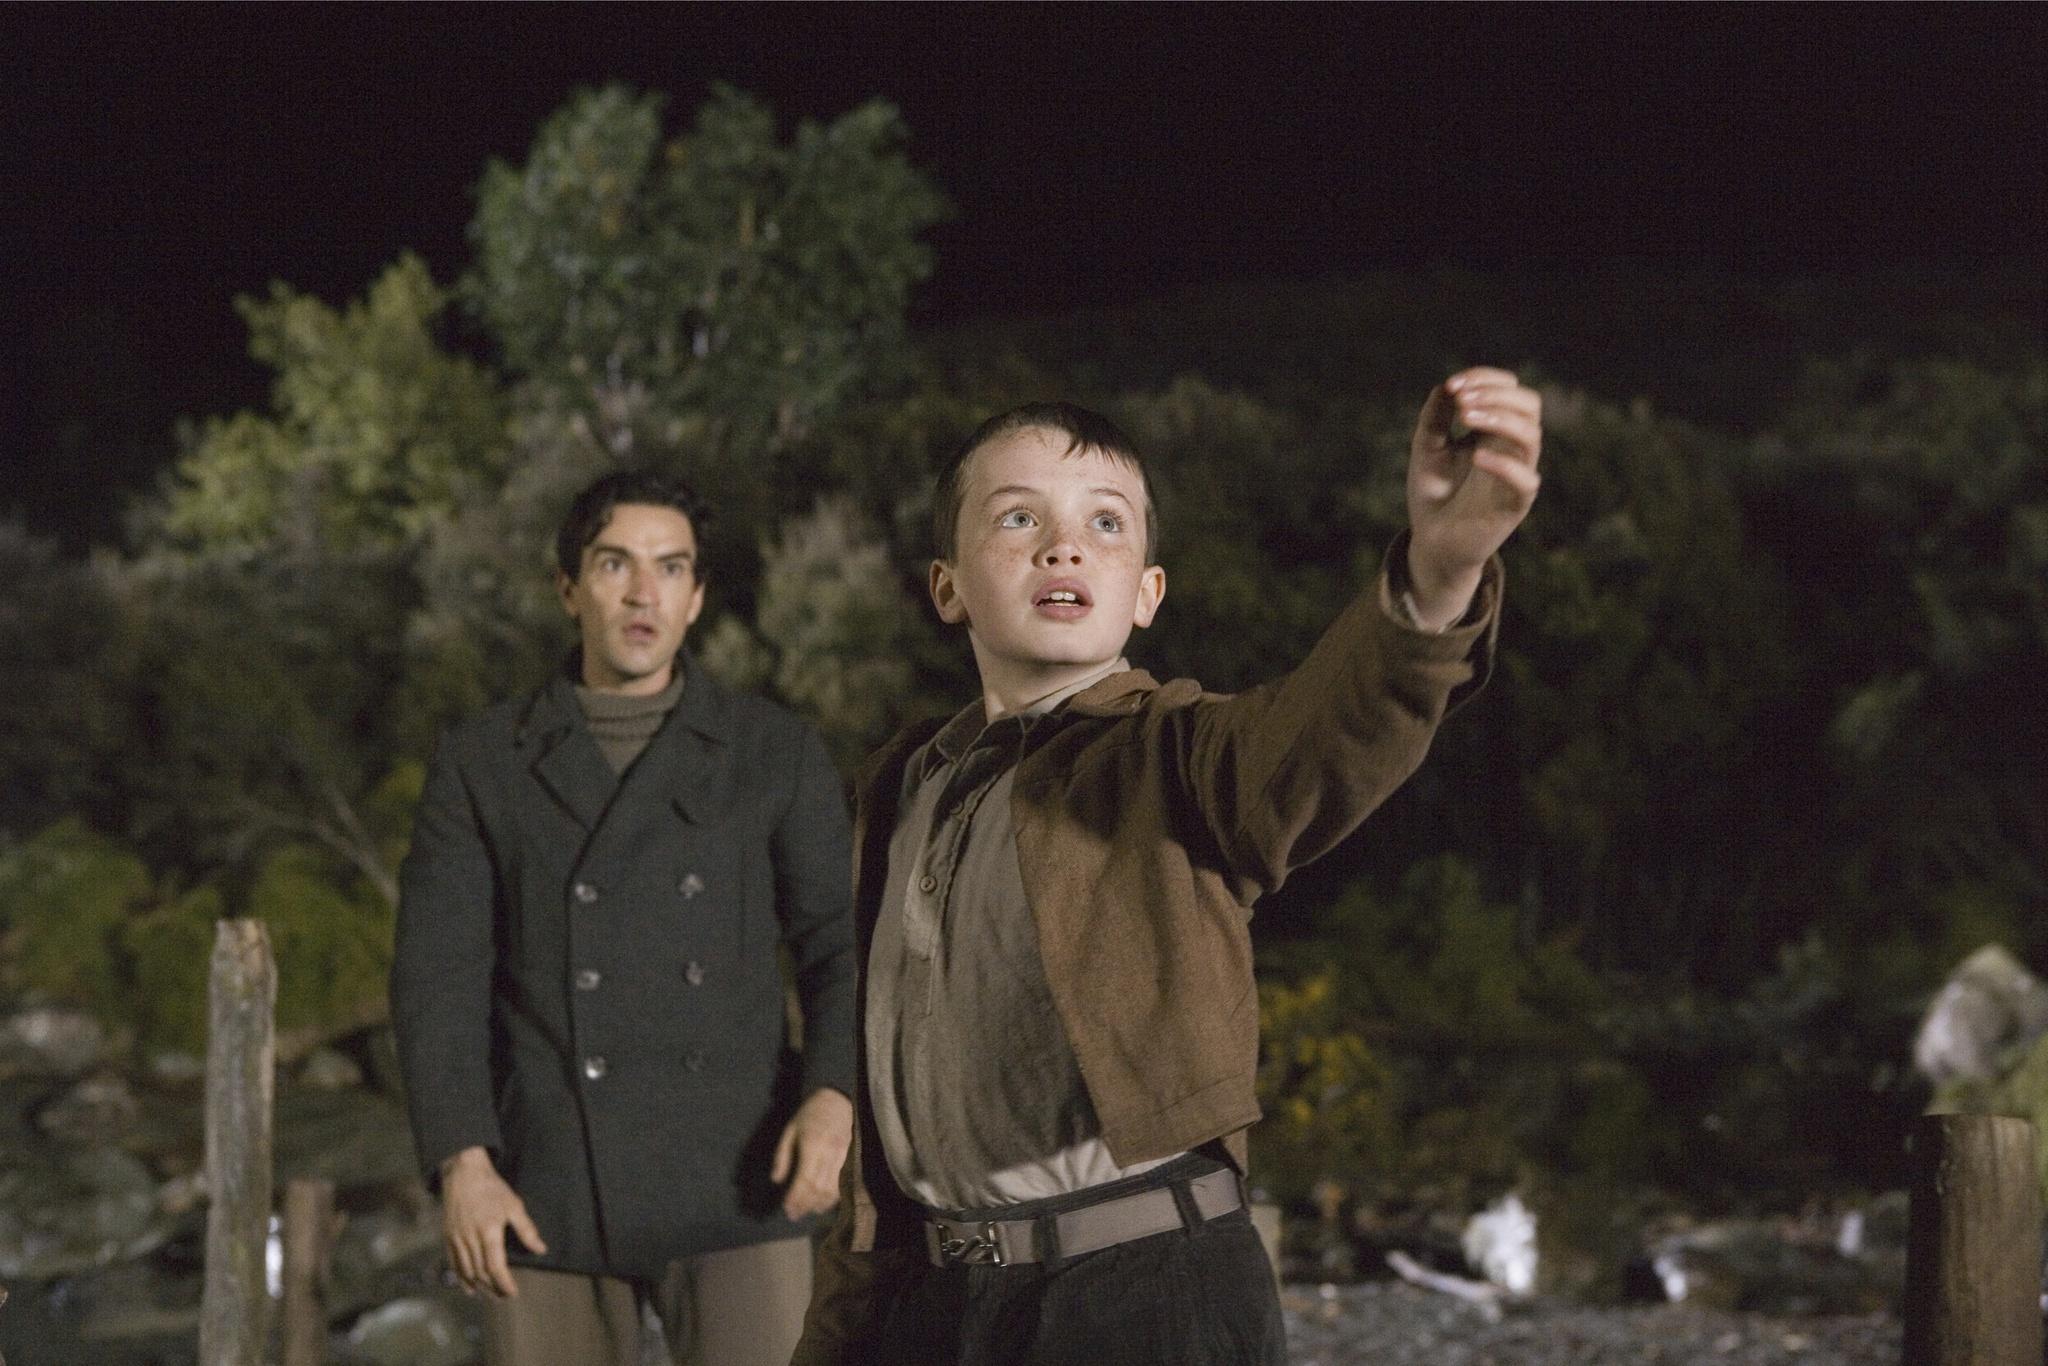 Still of Ben Chaplin and Alex Etel in The Water Horse (2007)